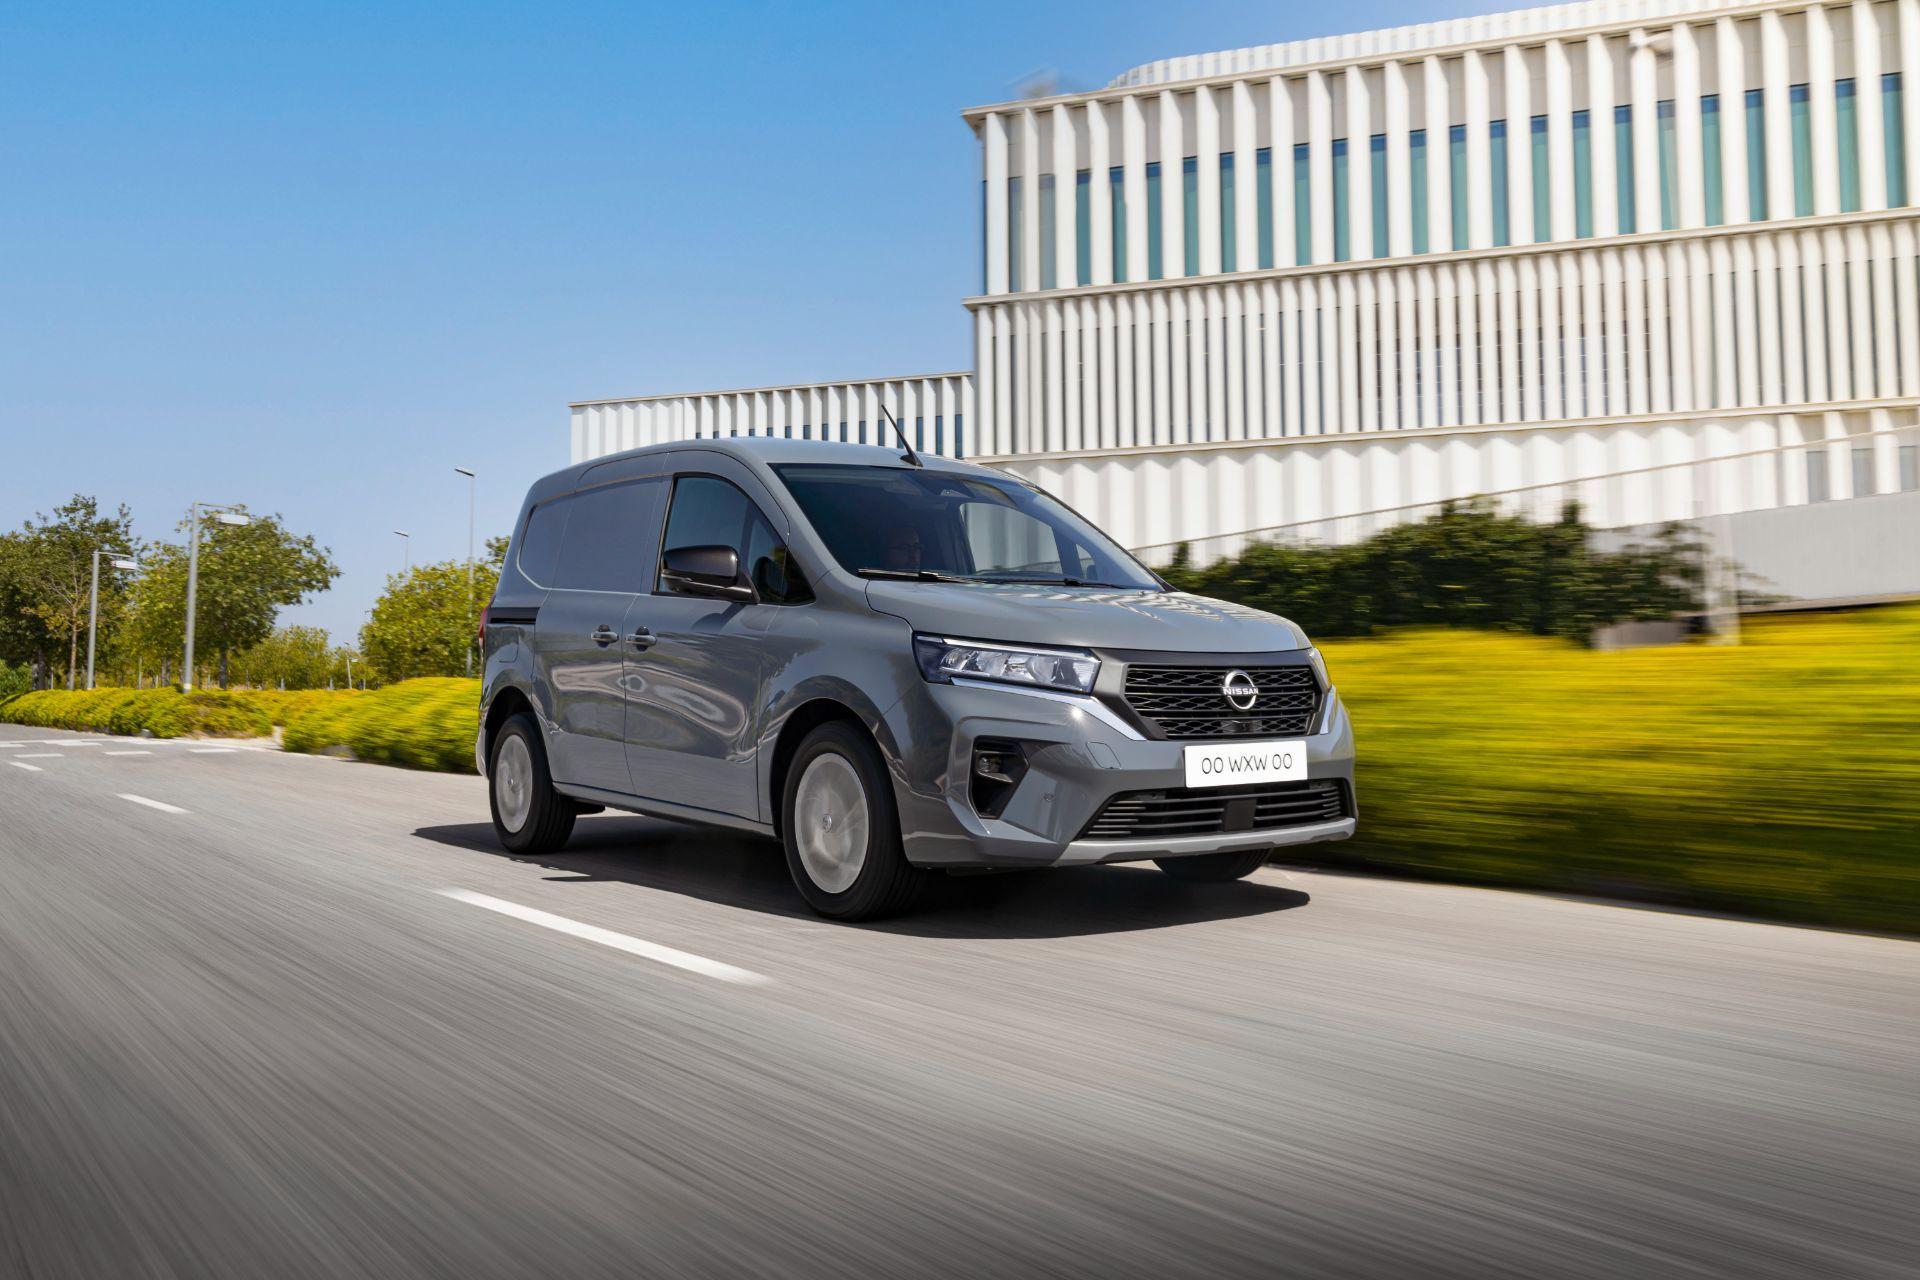 2022-Nissan-Townstar-petrol-van-dynamic-1